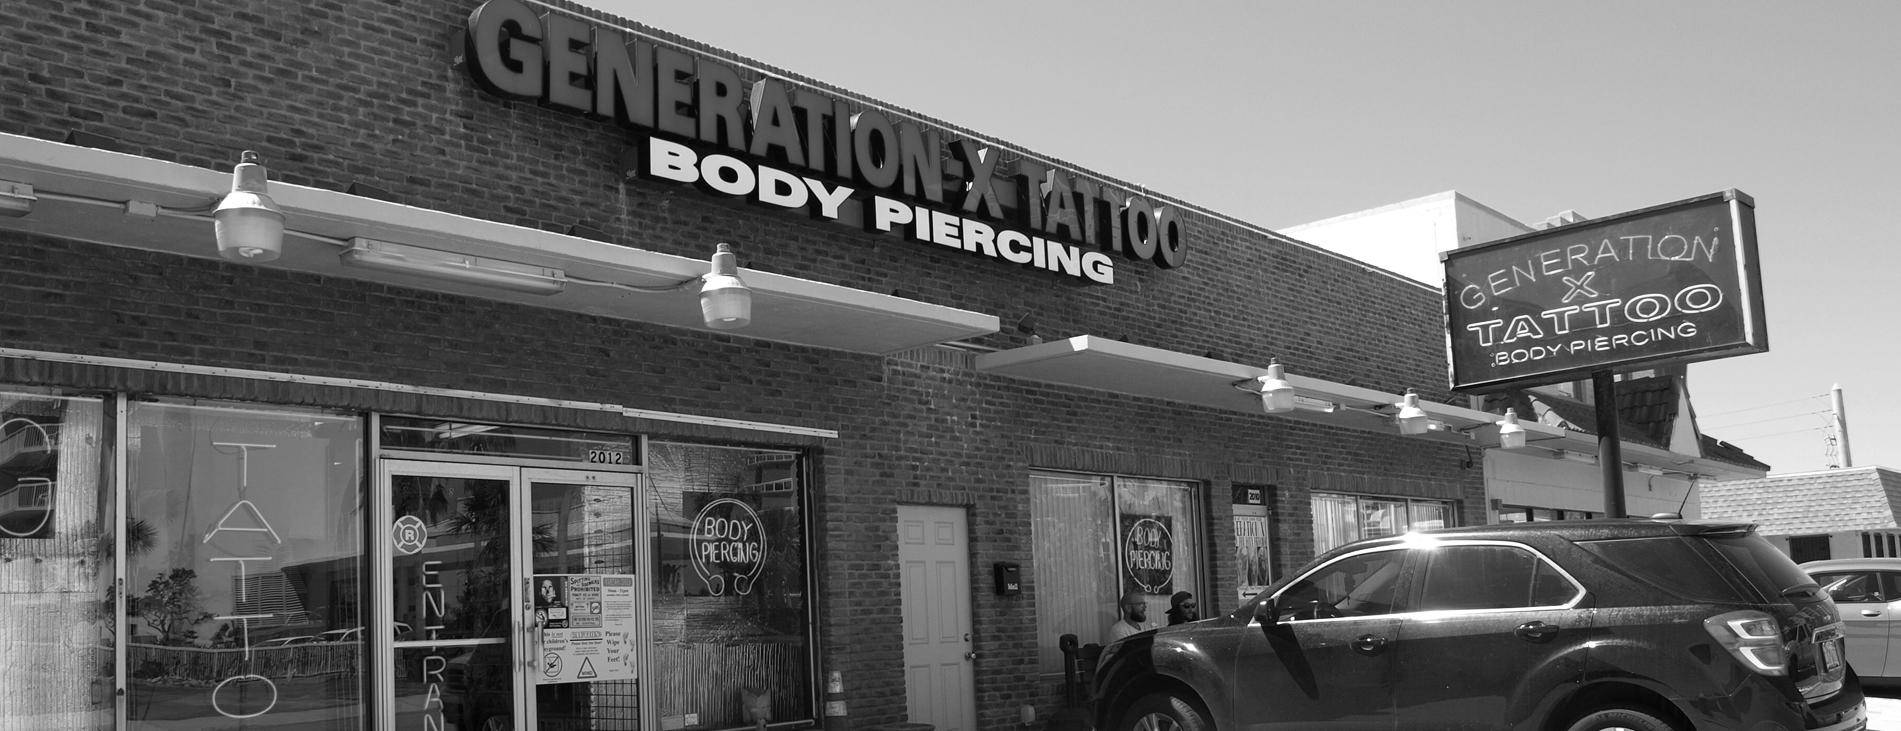 welcome to generation x tattoo the original daytona beach